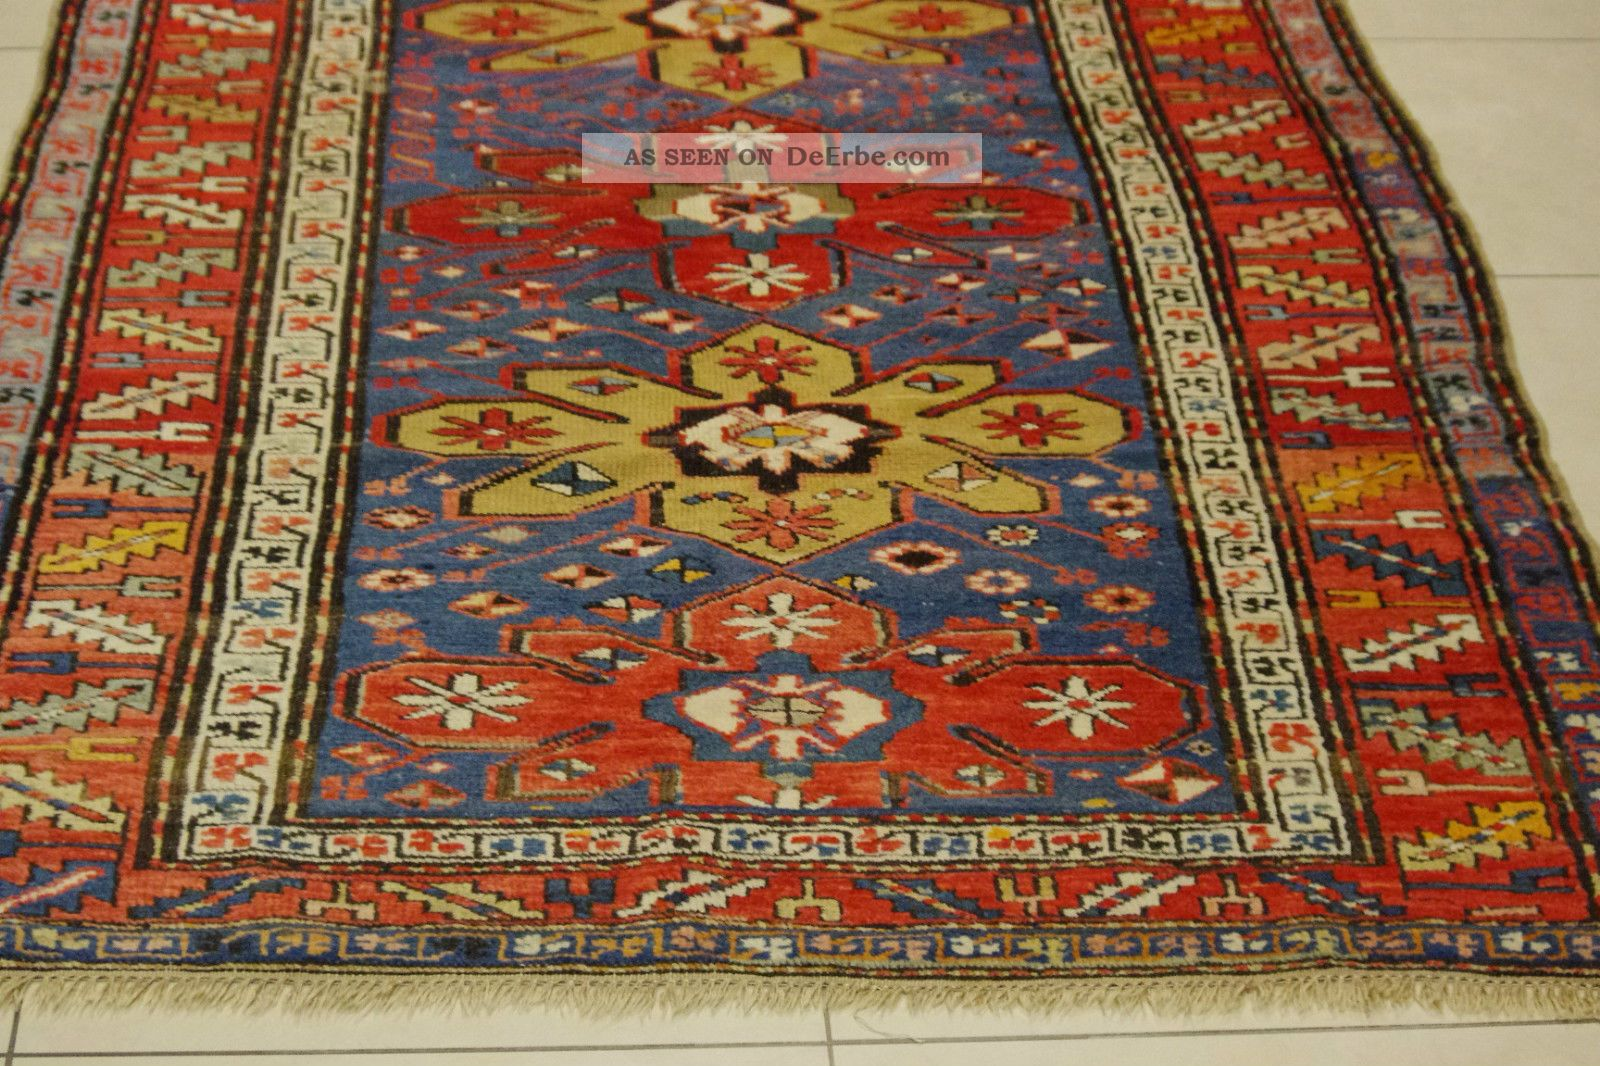 antik kazak teppich kaukasus 260x128cm antique caucasian rug tappeto tapis 0802. Black Bedroom Furniture Sets. Home Design Ideas